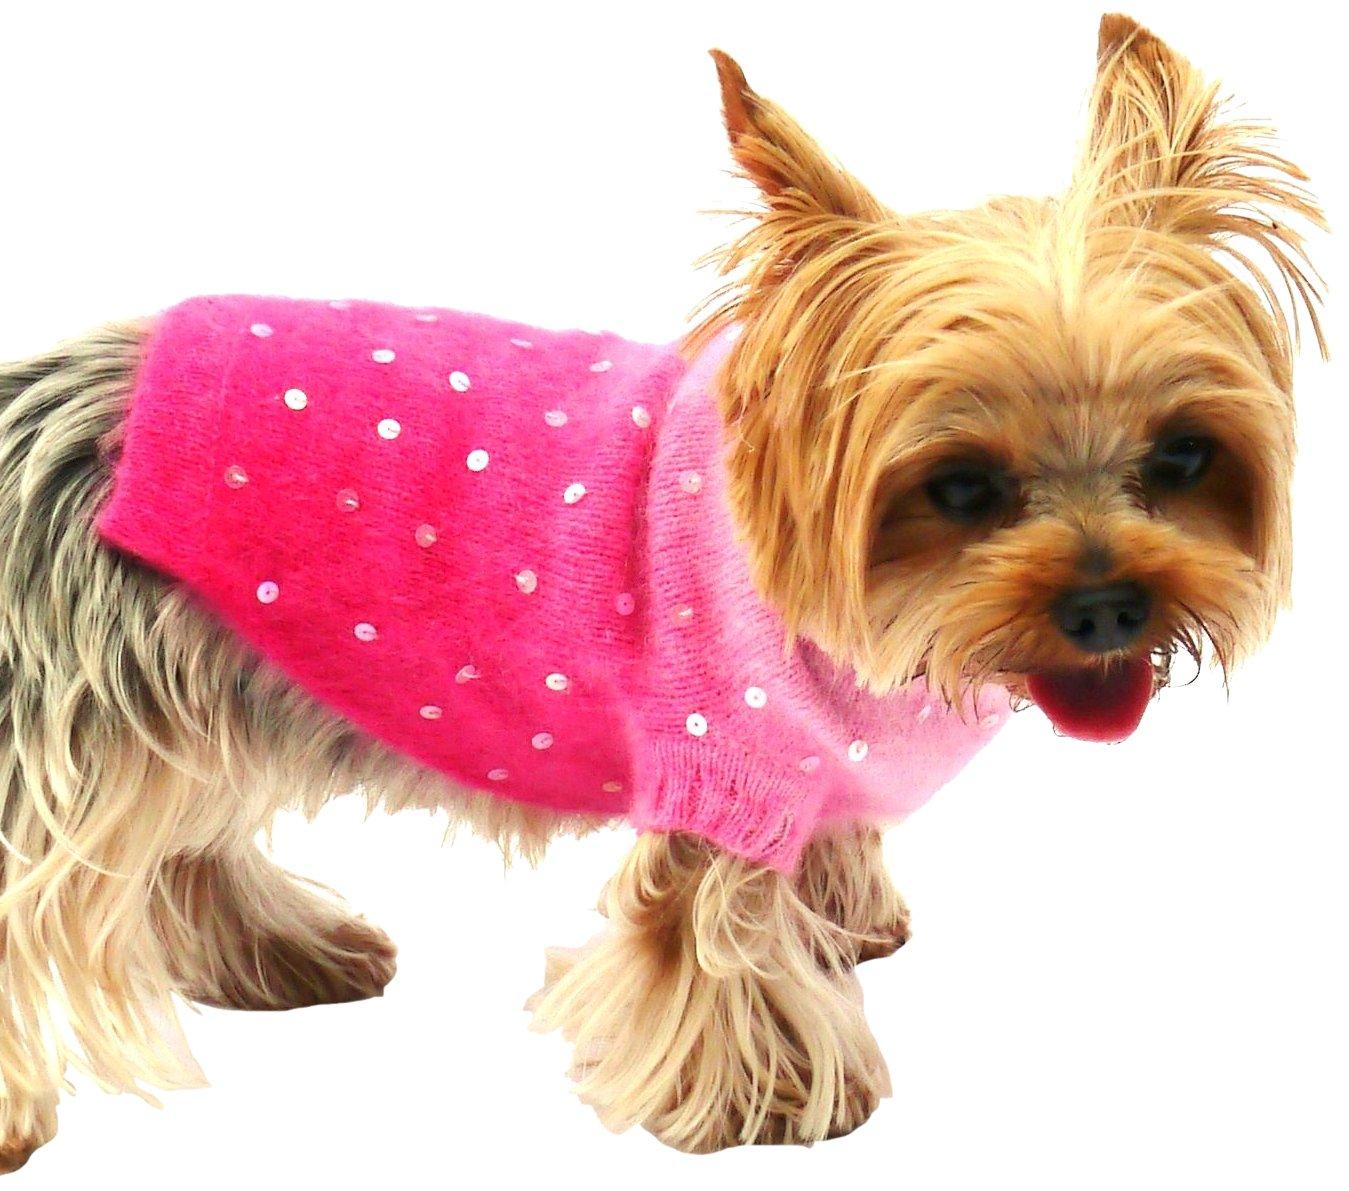 Luxury Sparkle Turtleneck, Angora Blend, Pink Sunset Dip Dye, S